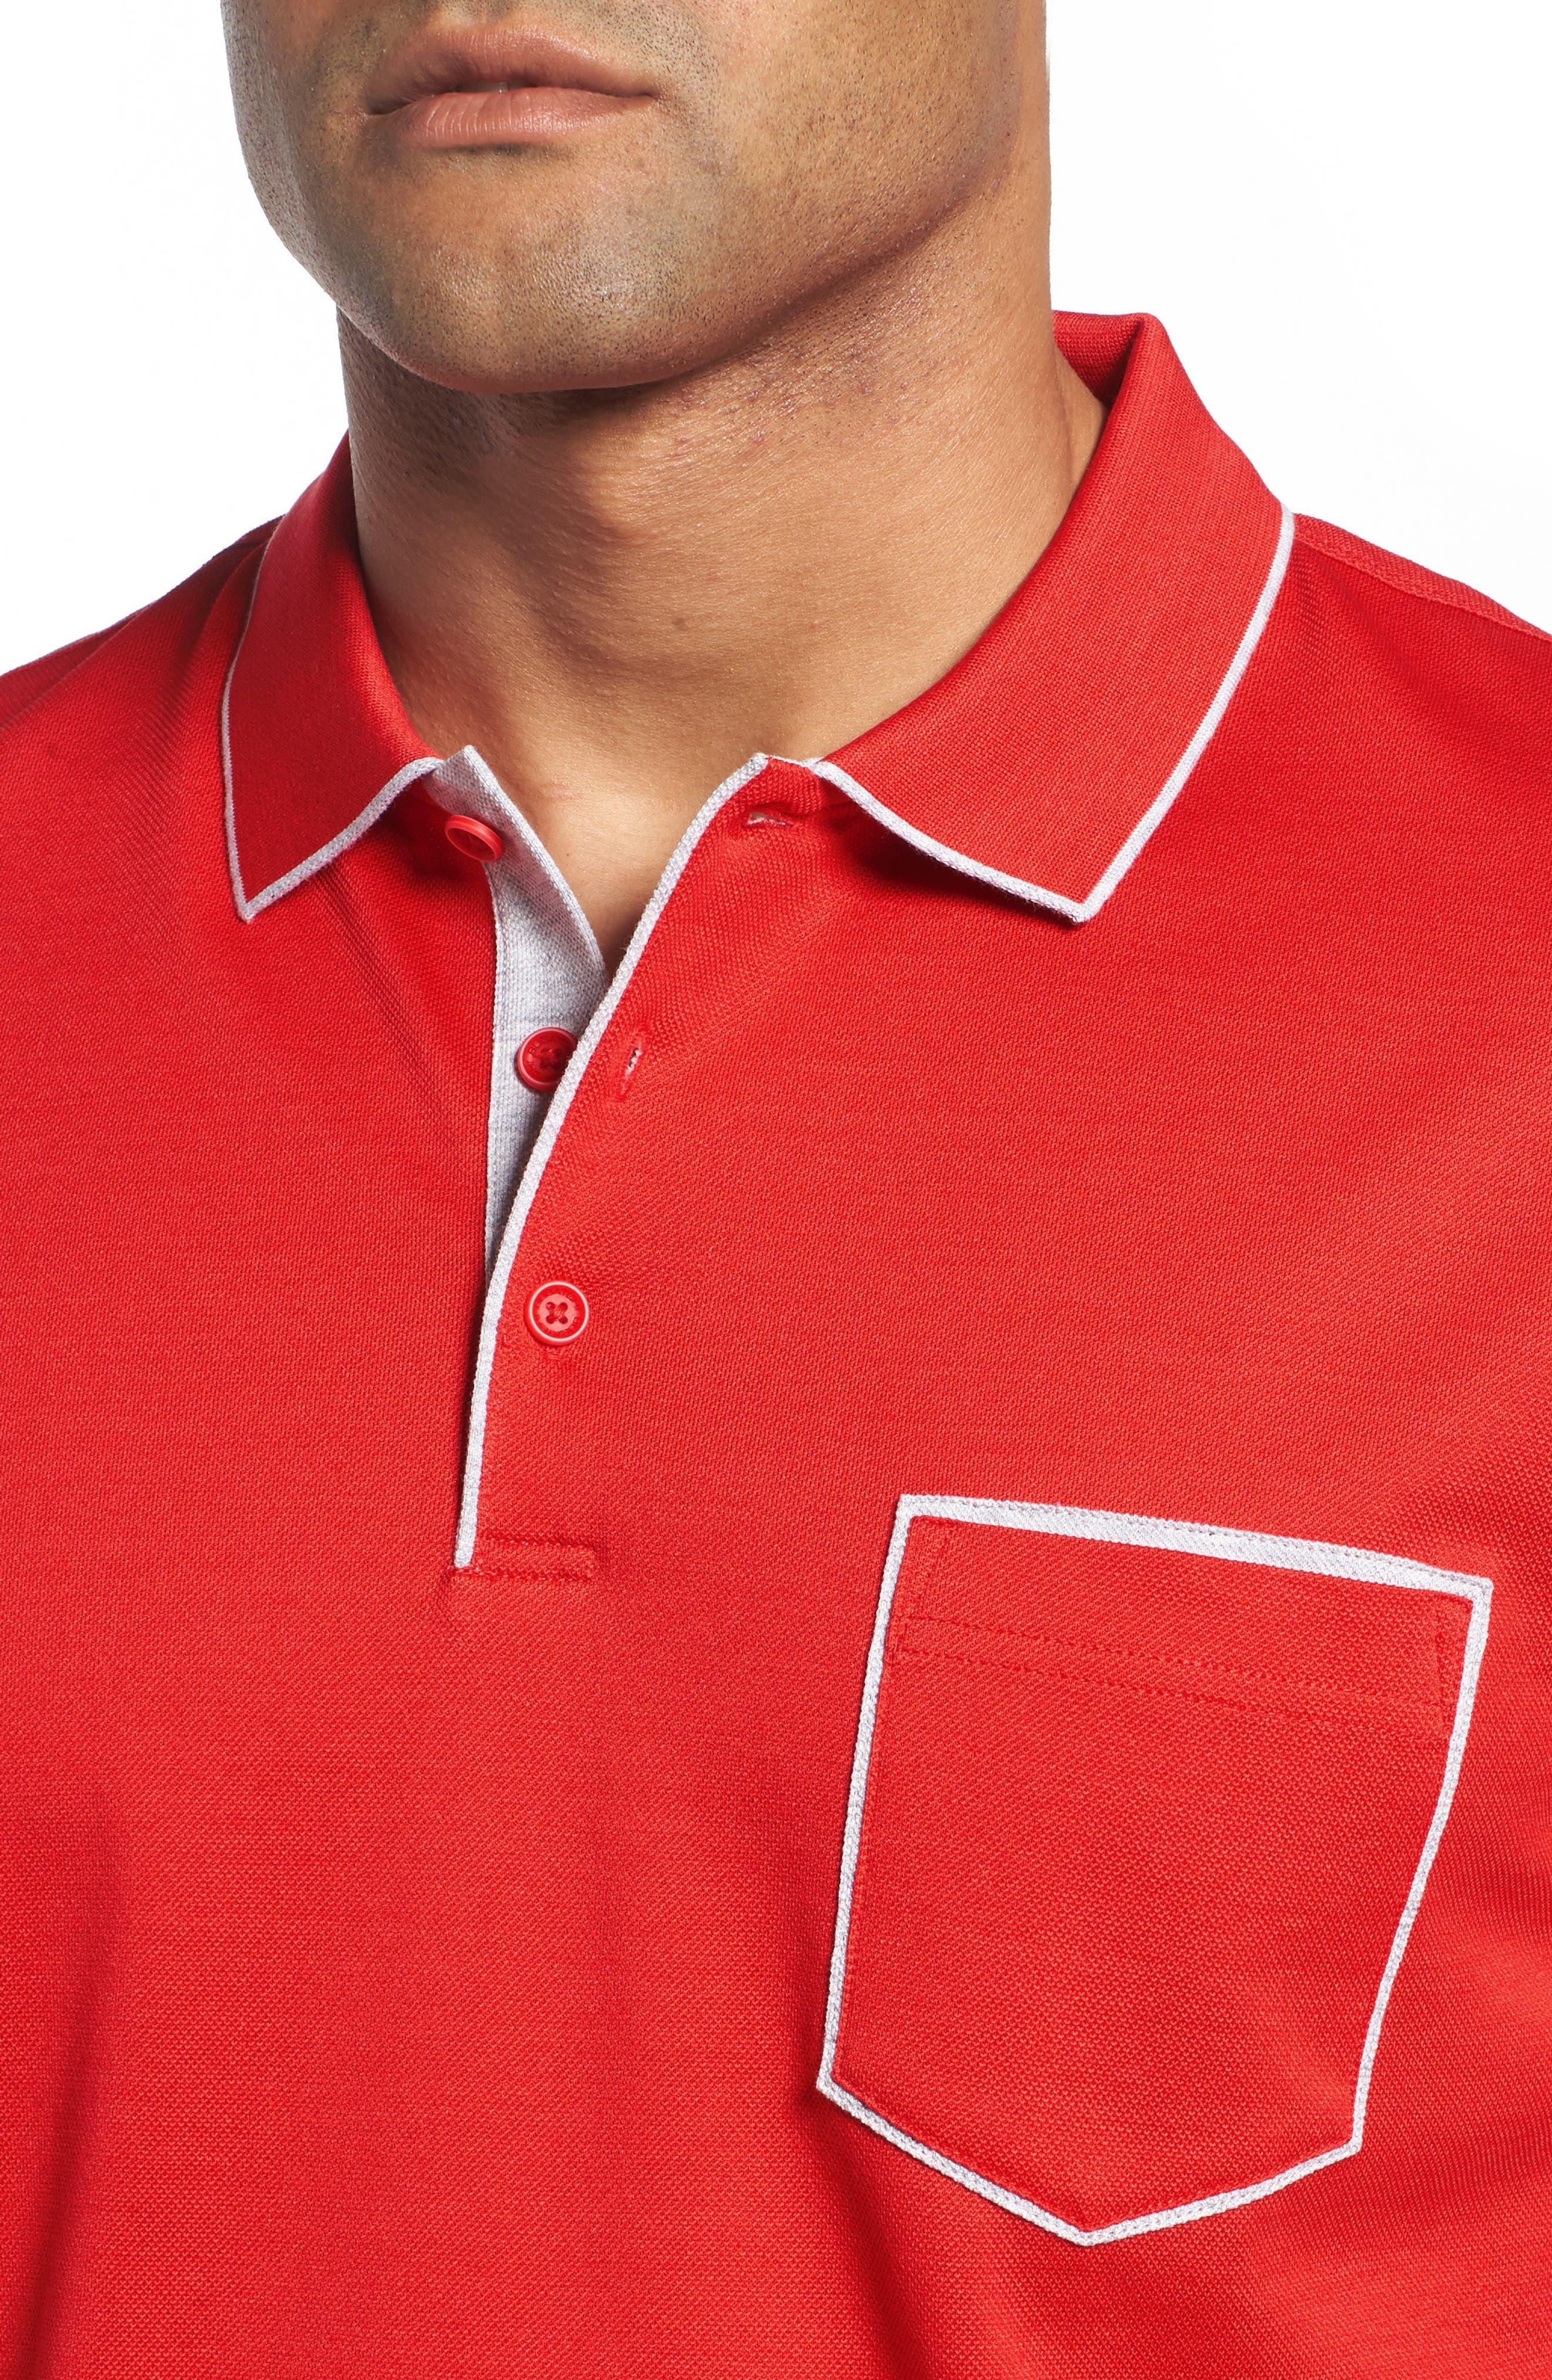 Piqué Knit Polo,                             Alternate thumbnail 4, color,                             Red